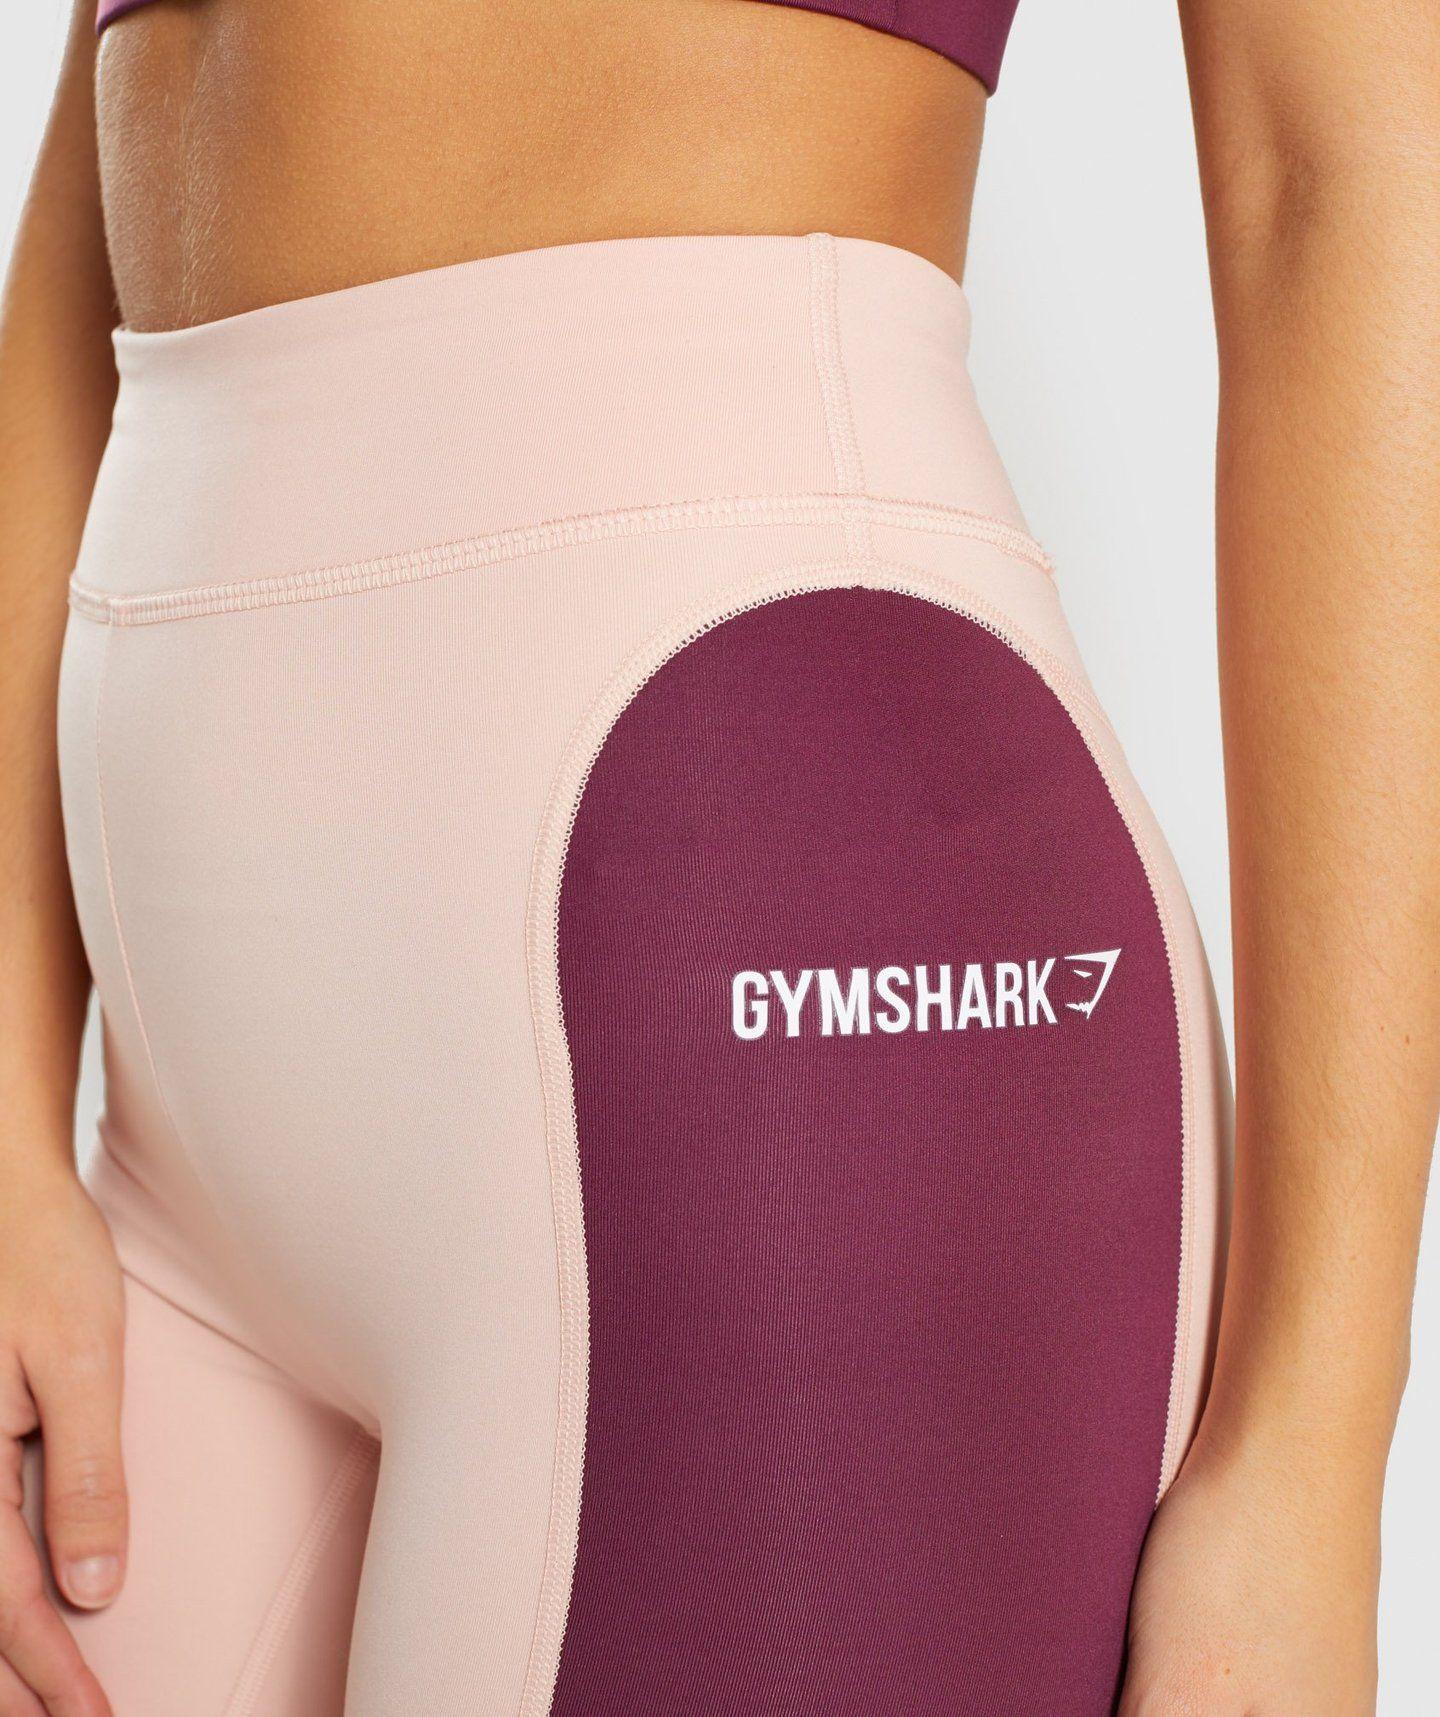 be05d31a83971 Gymshark Illusion Leggings - Dark Ruby Blush Nude Slate Lavender 4